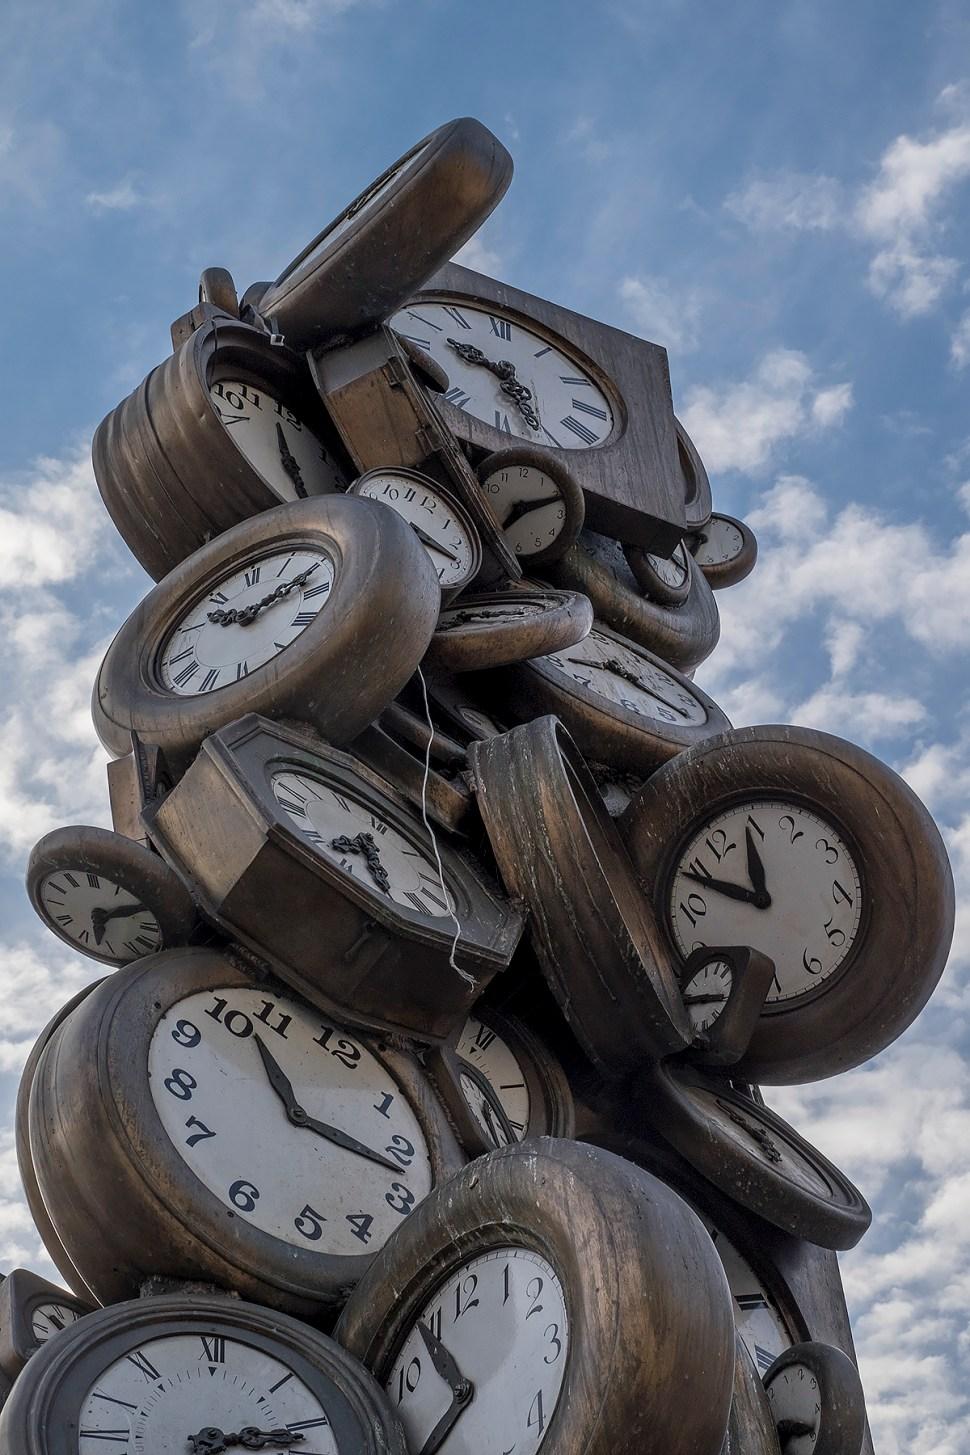 clocks_DSCF0070